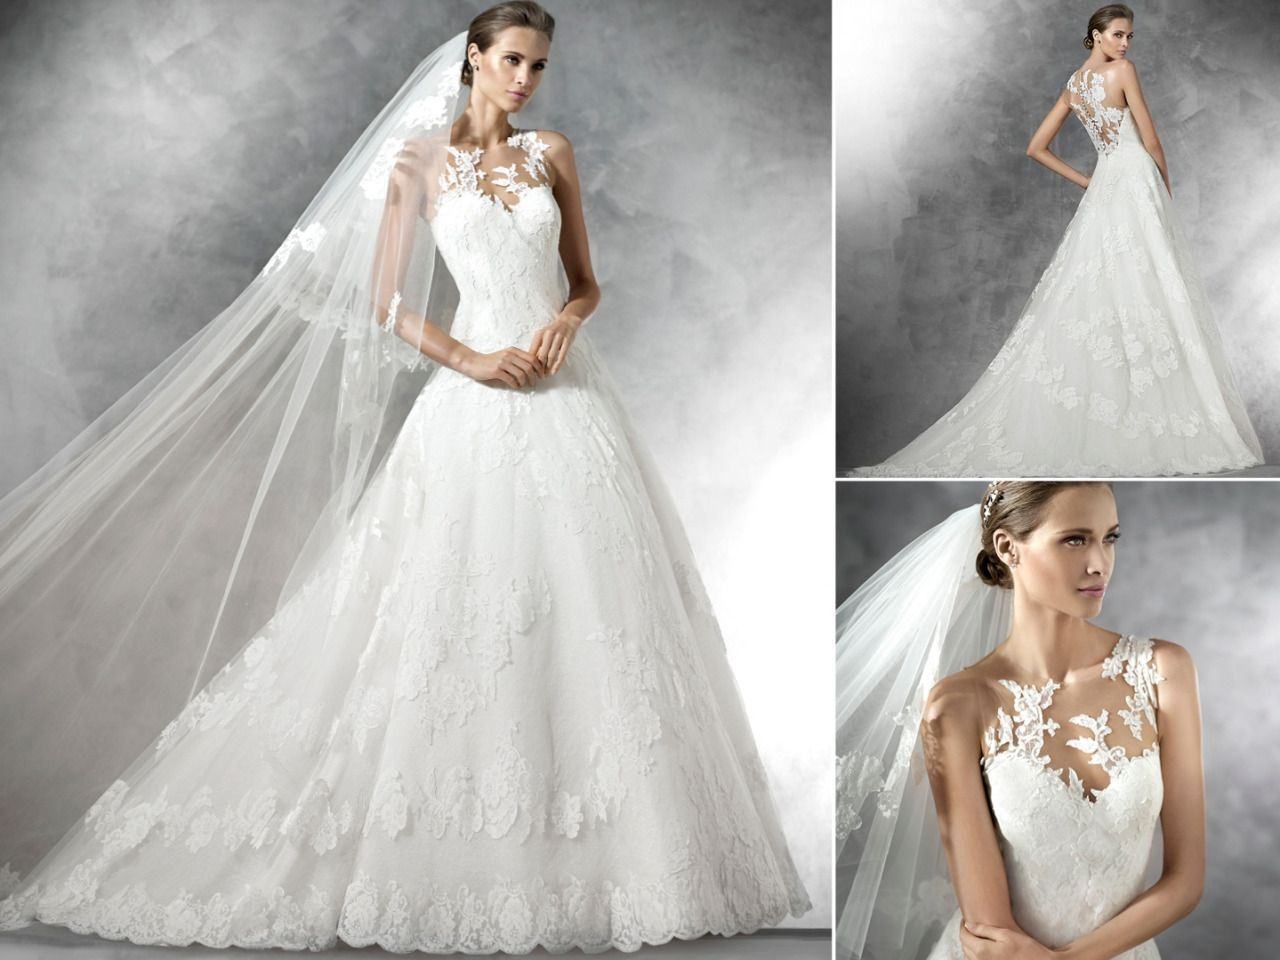 The Designer Bridal Room FASHION Designer Bridal Room has a New